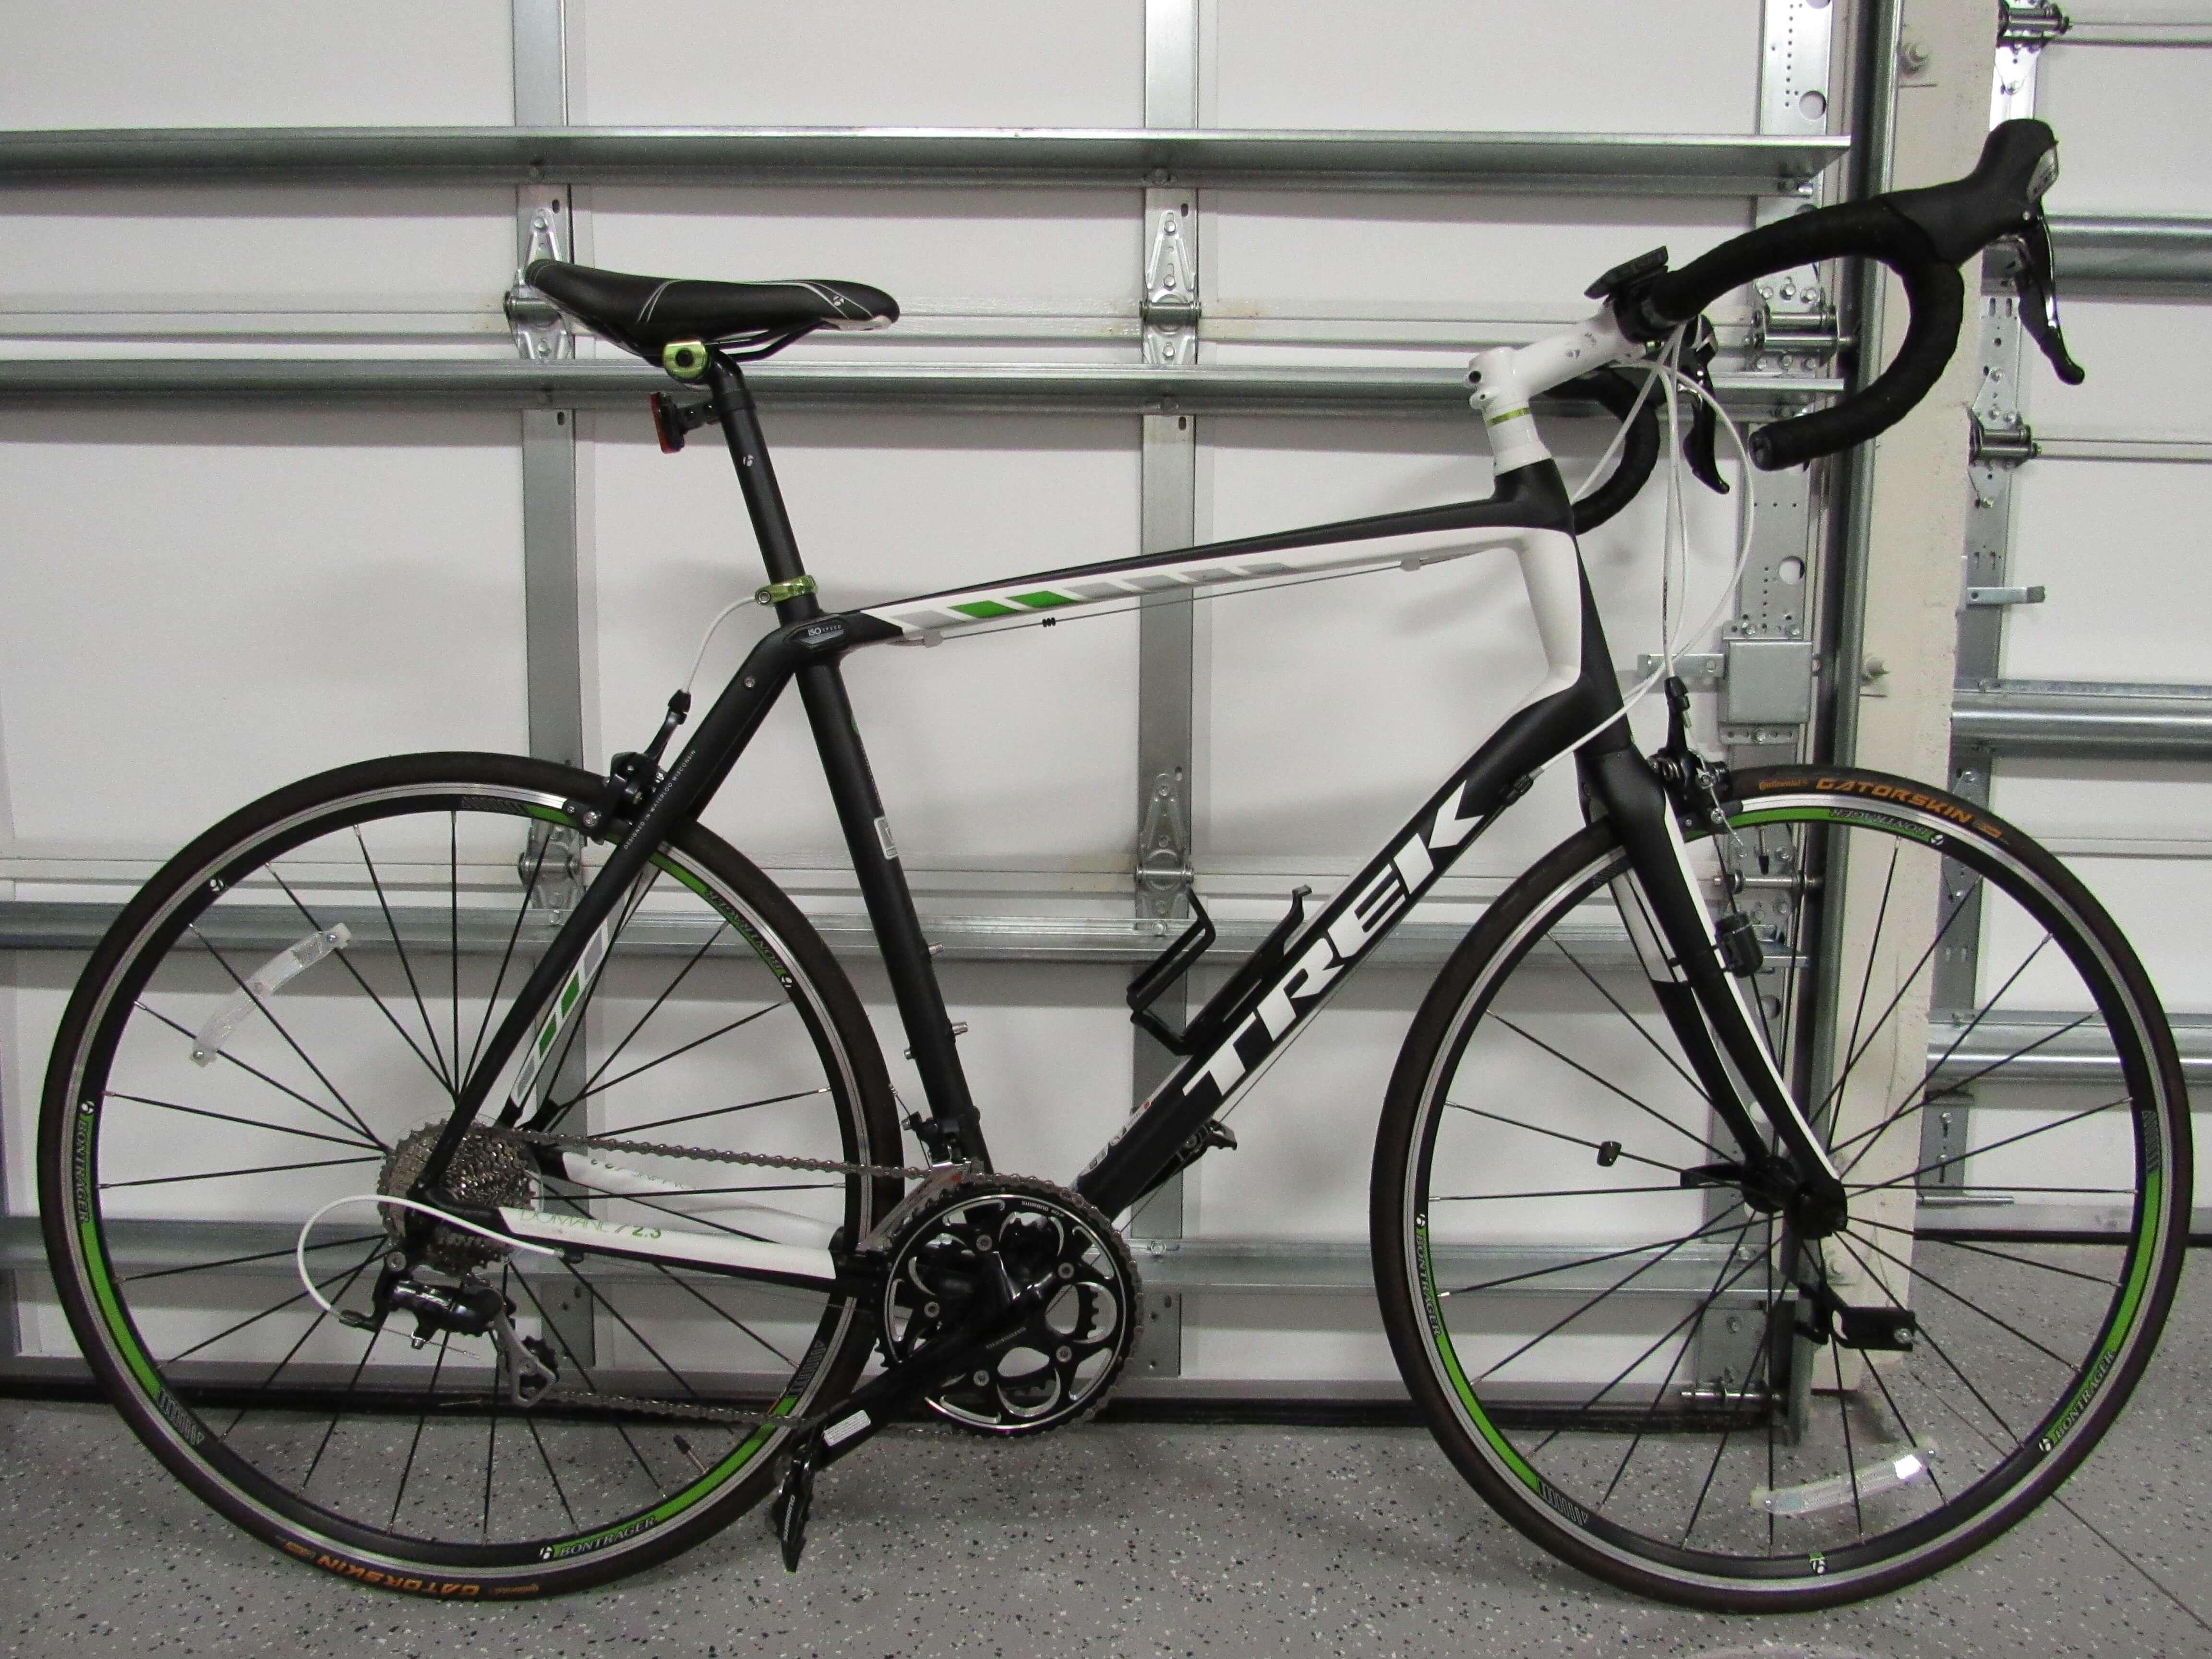 2406a4d9064 Trek Domane 2.3 For Sale - 6850 - BicycleBlueBook.com